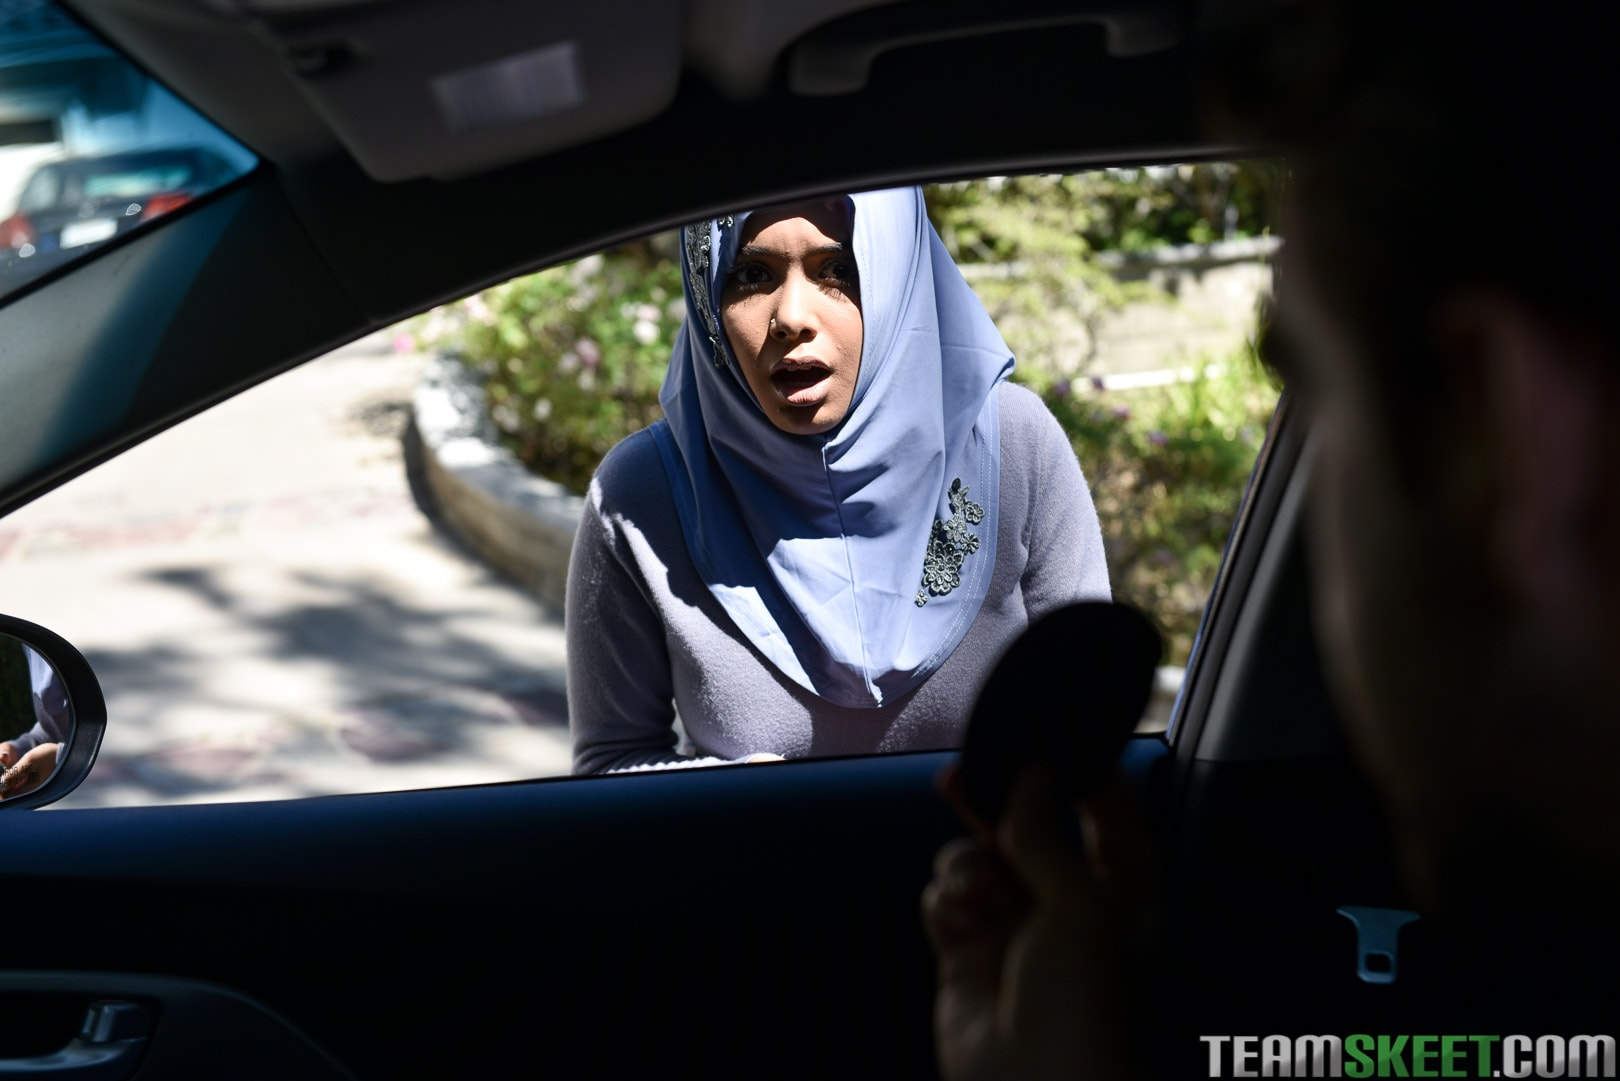 Team Skeet 'Teenage Anal In Her Hijab' starring Aaliyah Hadid (Photo 80)